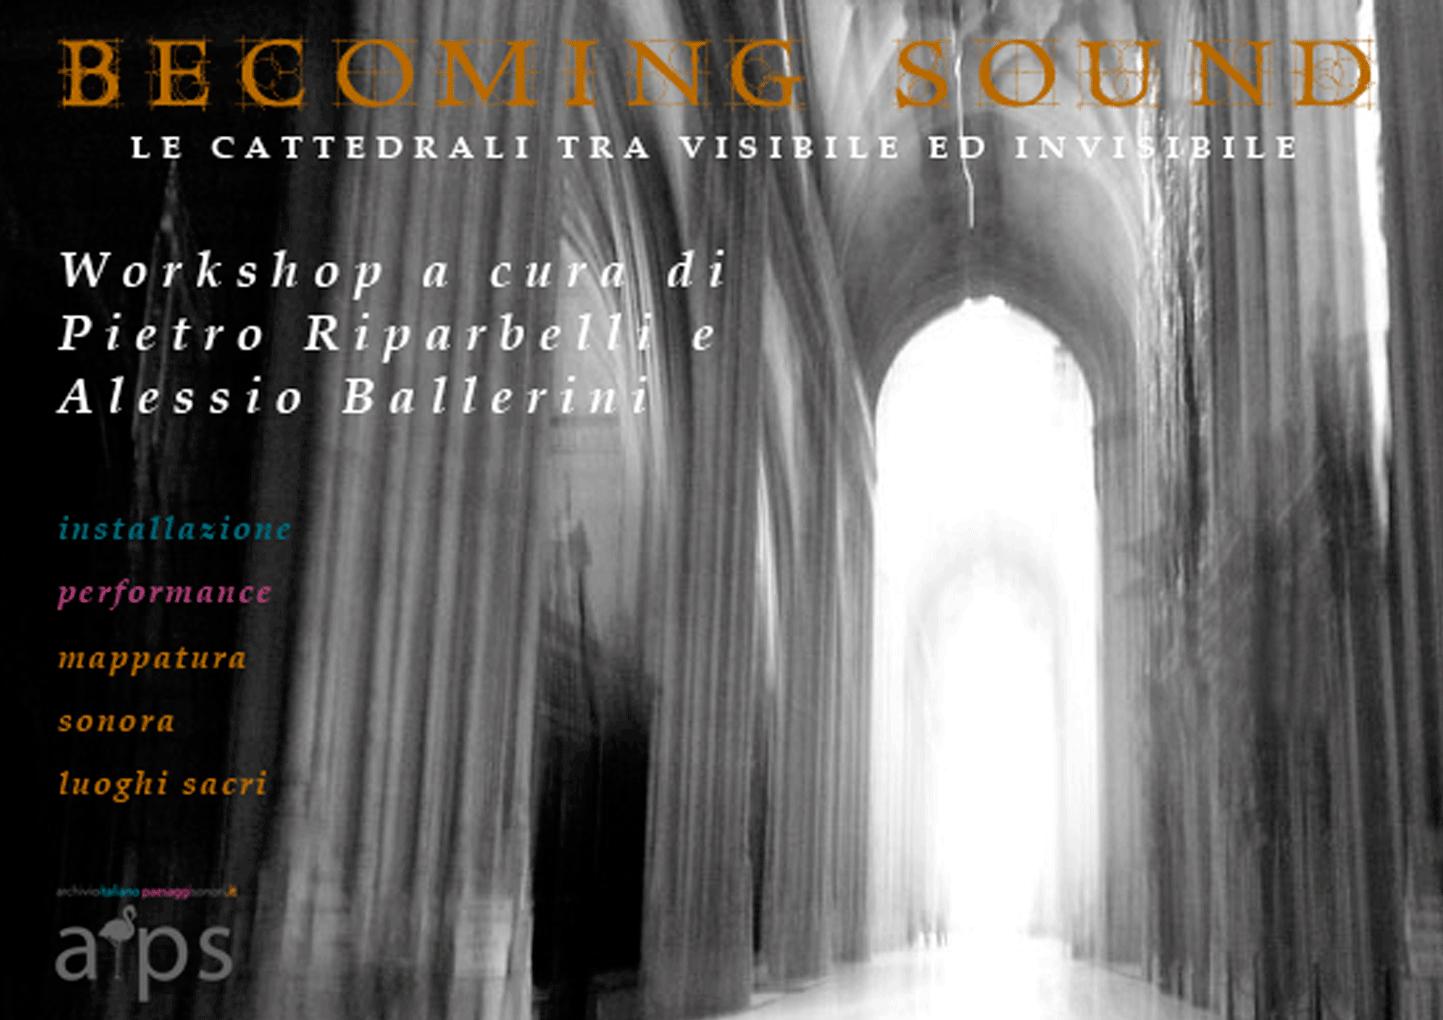 BECOMING SOUND WORKSHOP | 26/27.04.2014